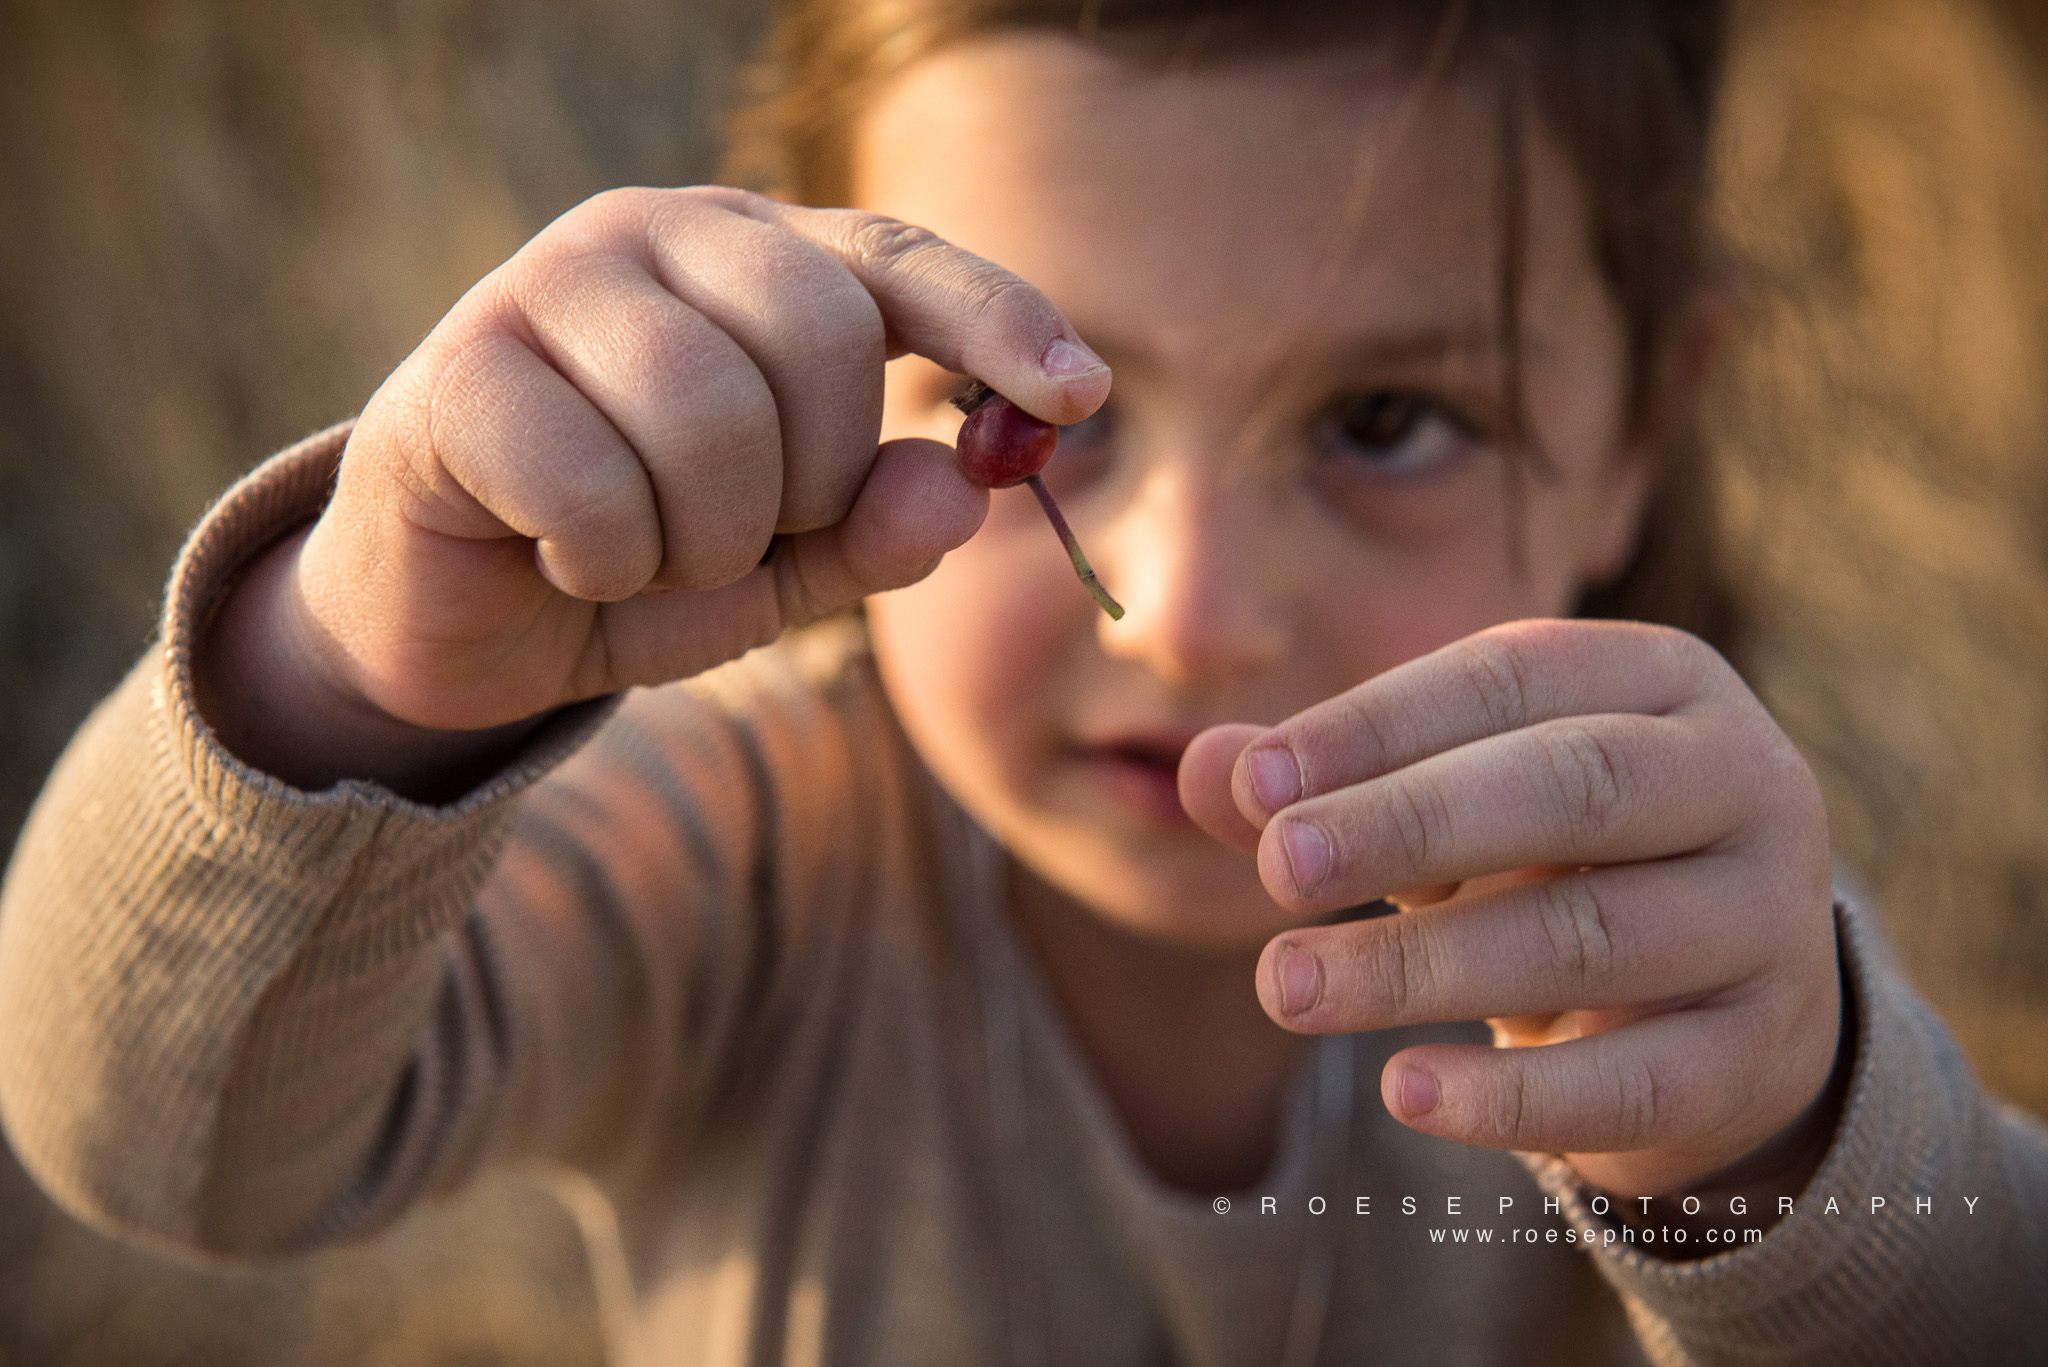 C.-Roese-Ramp-Roese-Photography-LLC.-Bennett-Family-8.jpg